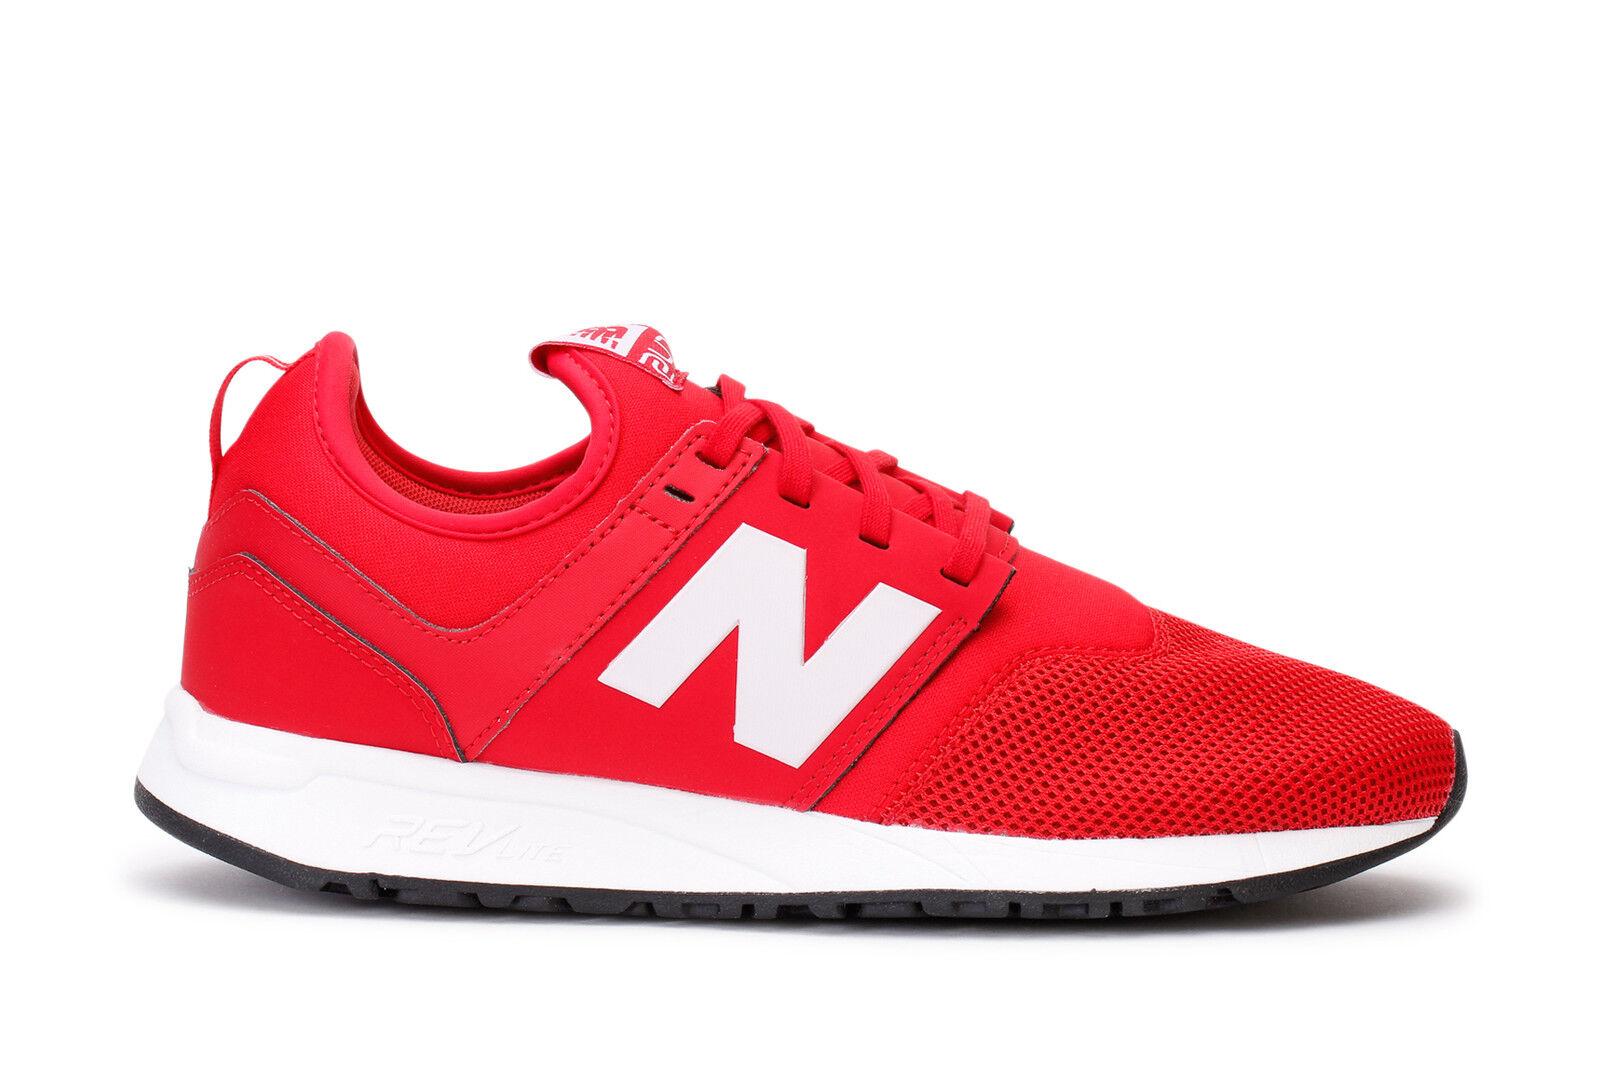 New Balance Mens Sneakers 247 Classic Red White MRL247RW